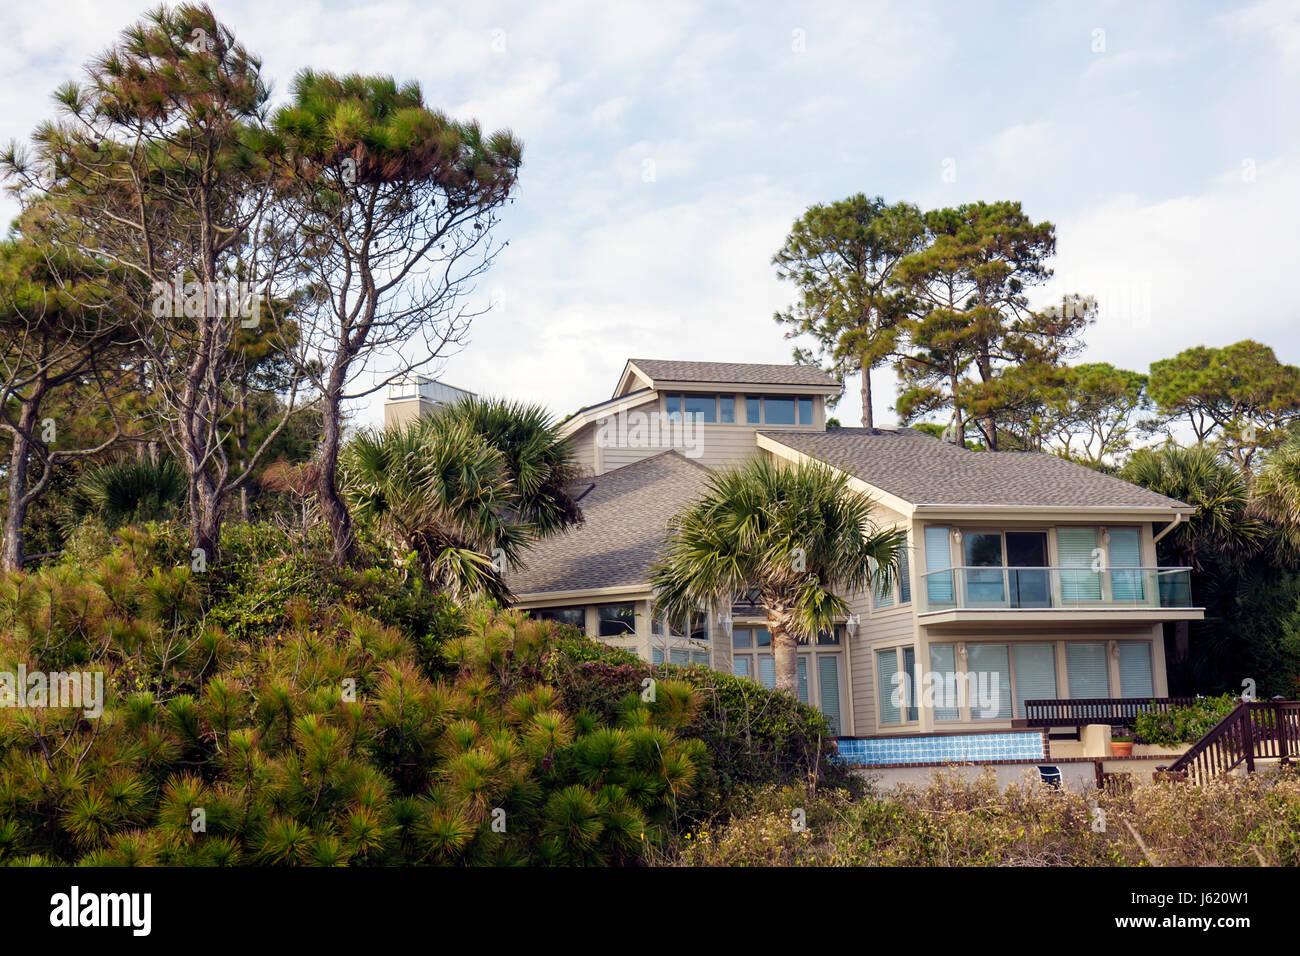 South Carolina Hilton Head Island Sea Pines Plantation Atlantic Ocean resort beach house home exclusive upscale - Stock Image